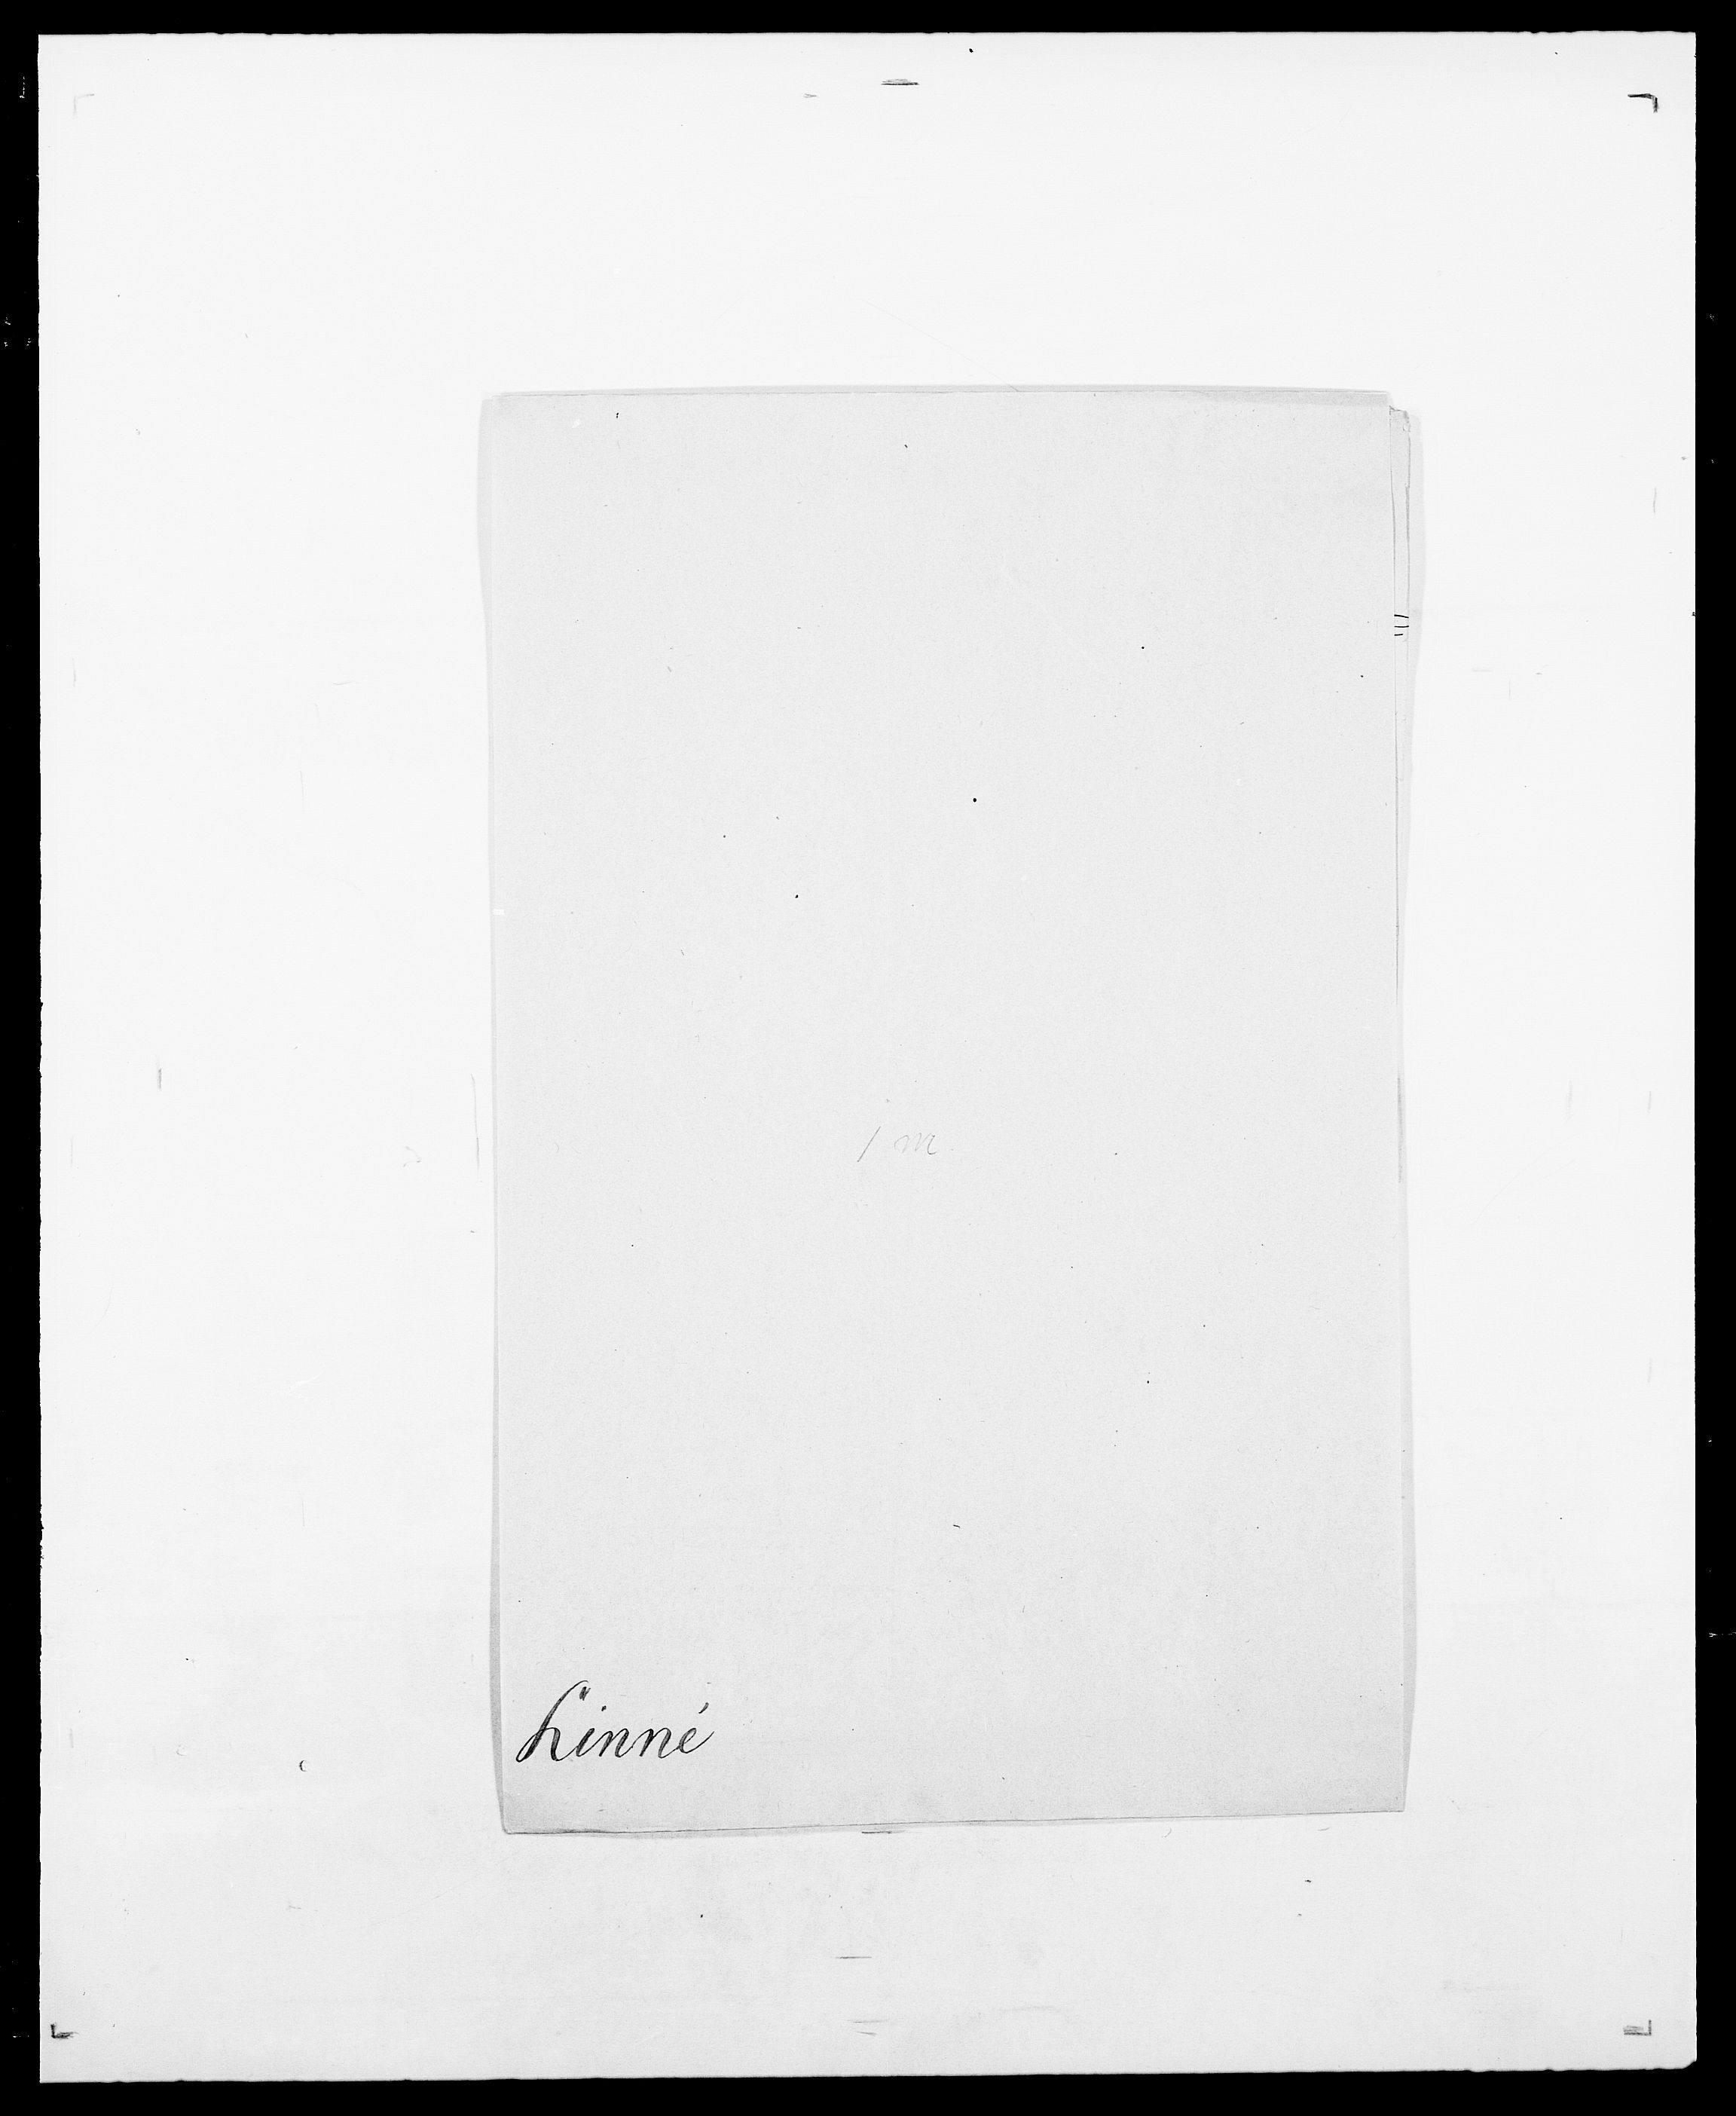 SAO, Delgobe, Charles Antoine - samling, D/Da/L0023: Lau - Lirvyn, s. 661